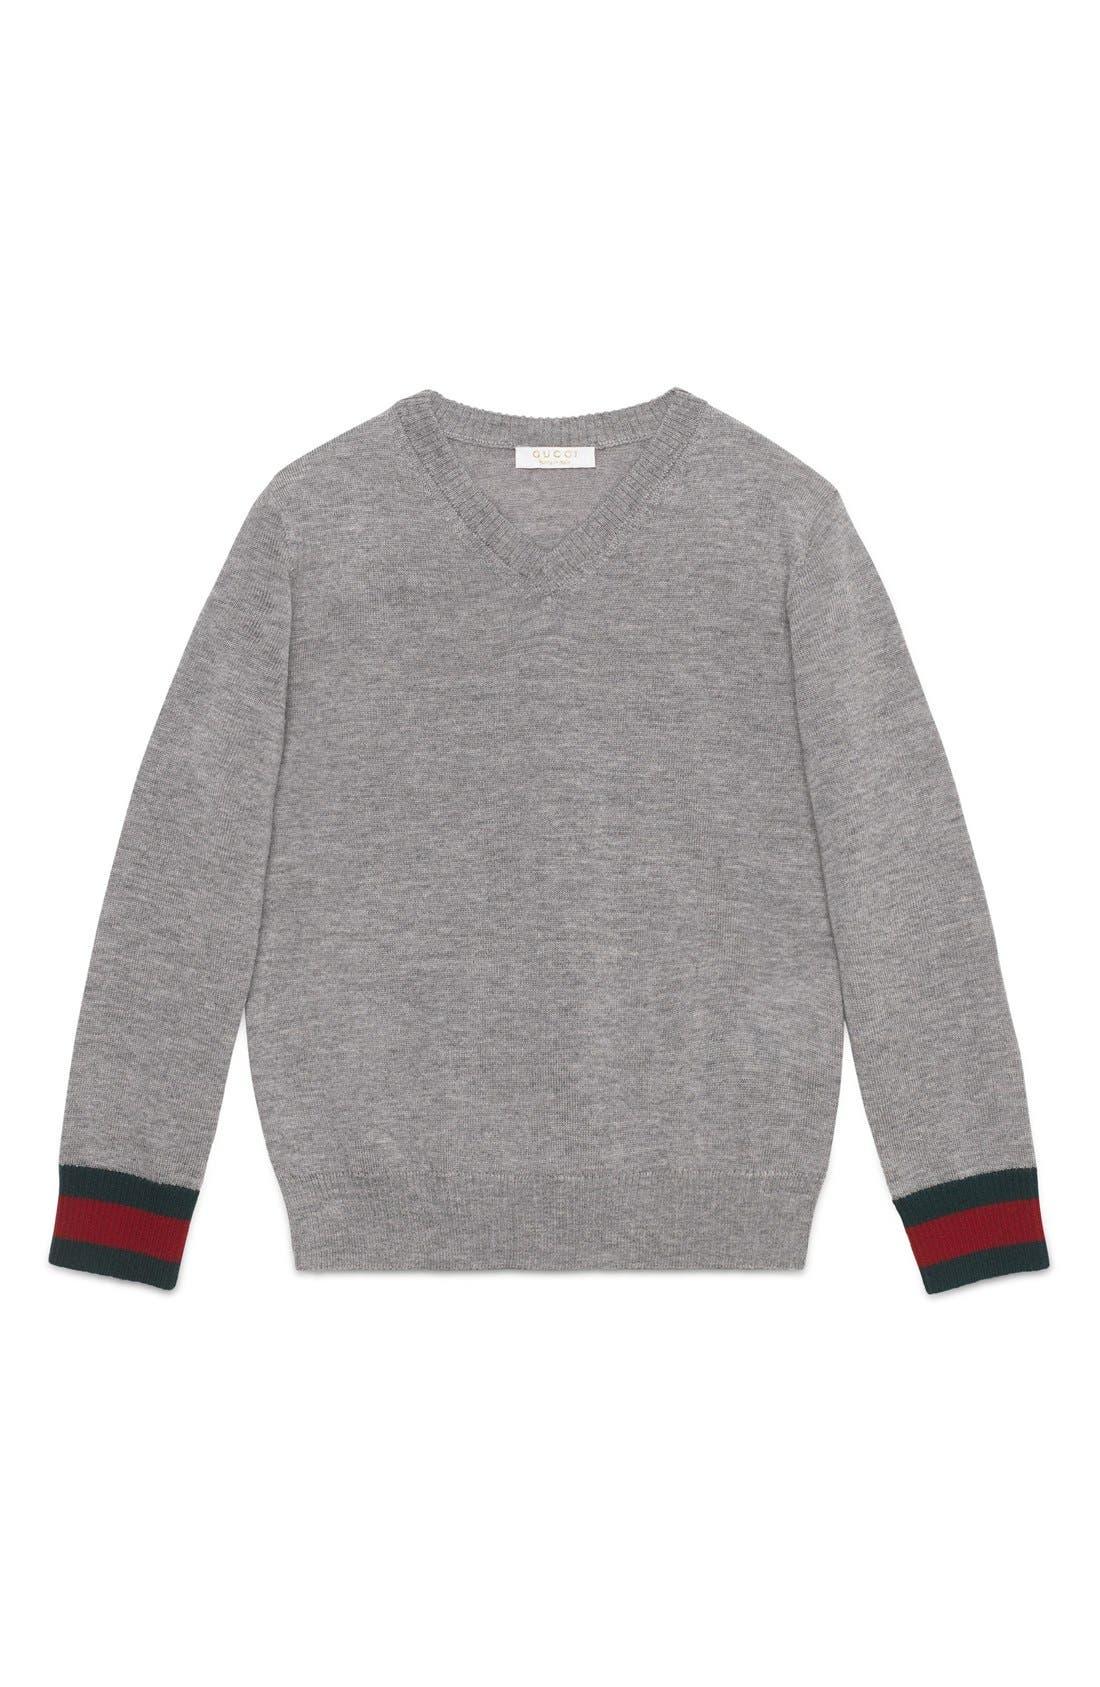 Stripe Cuff V-Neck Merino Wool Sweater,                             Main thumbnail 1, color,                             GREY MULTI